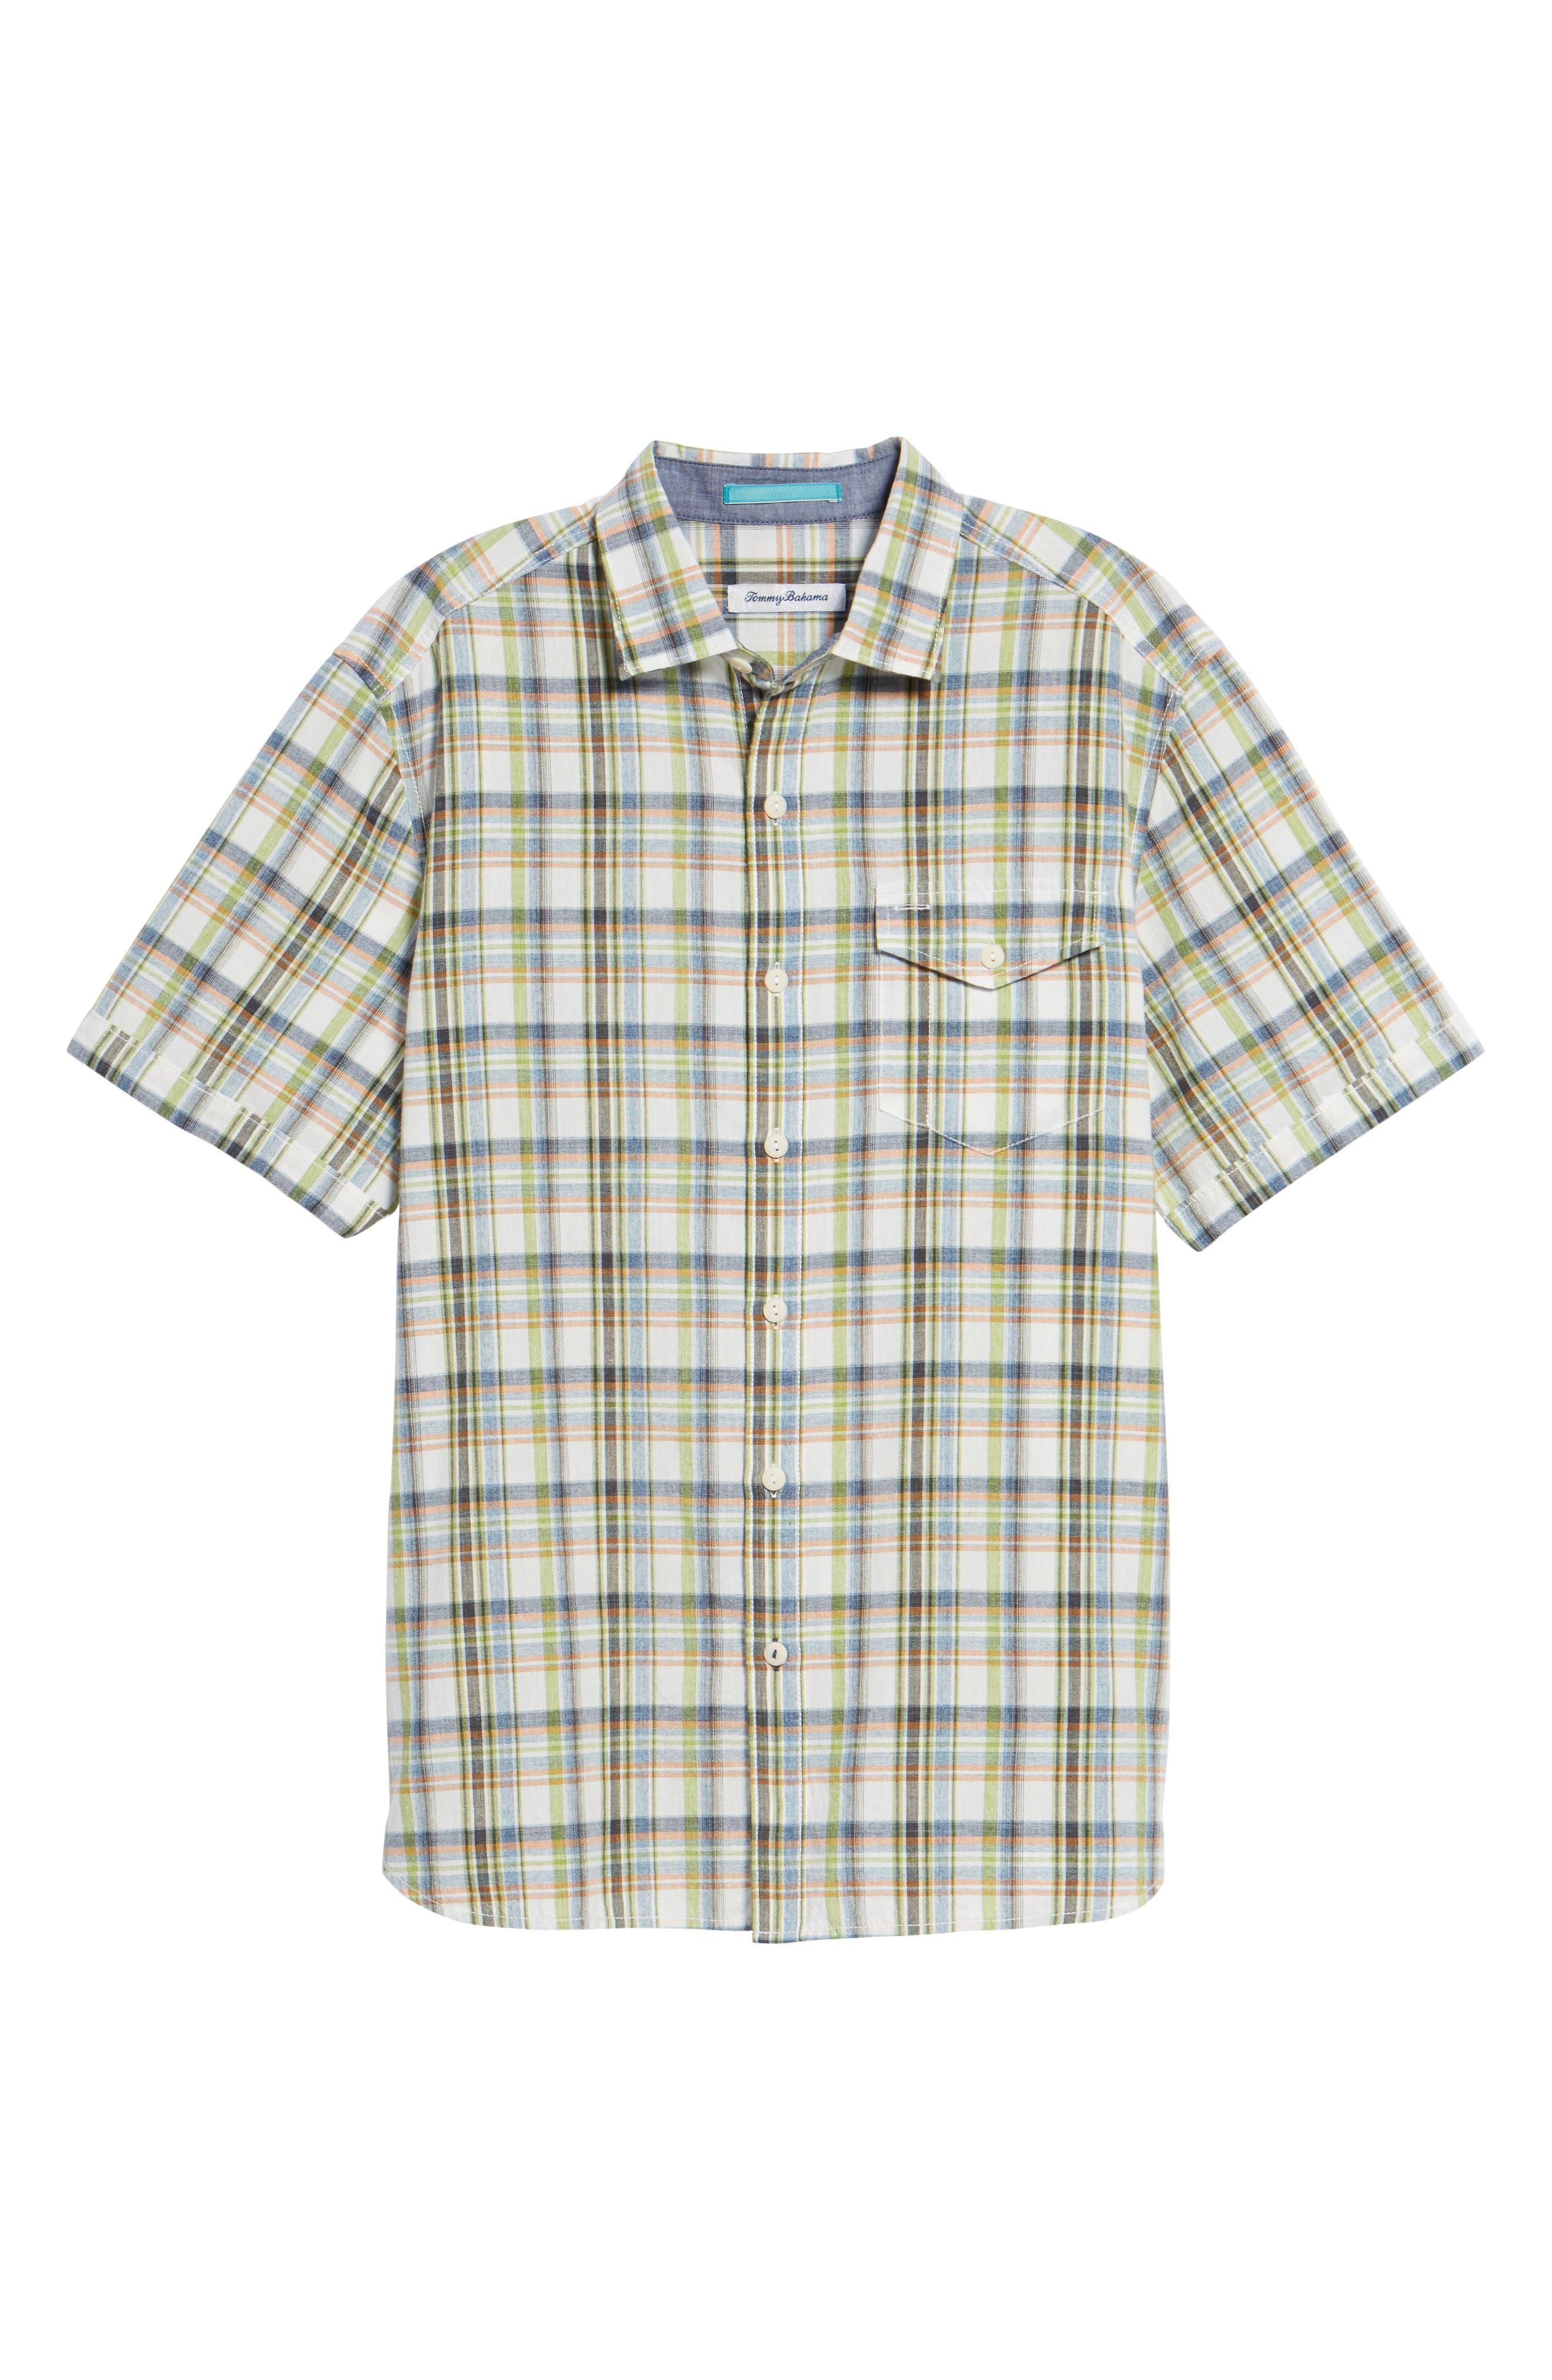 Ocean Cay Plaid Sport Shirt,                             Alternate thumbnail 6, color,                             300